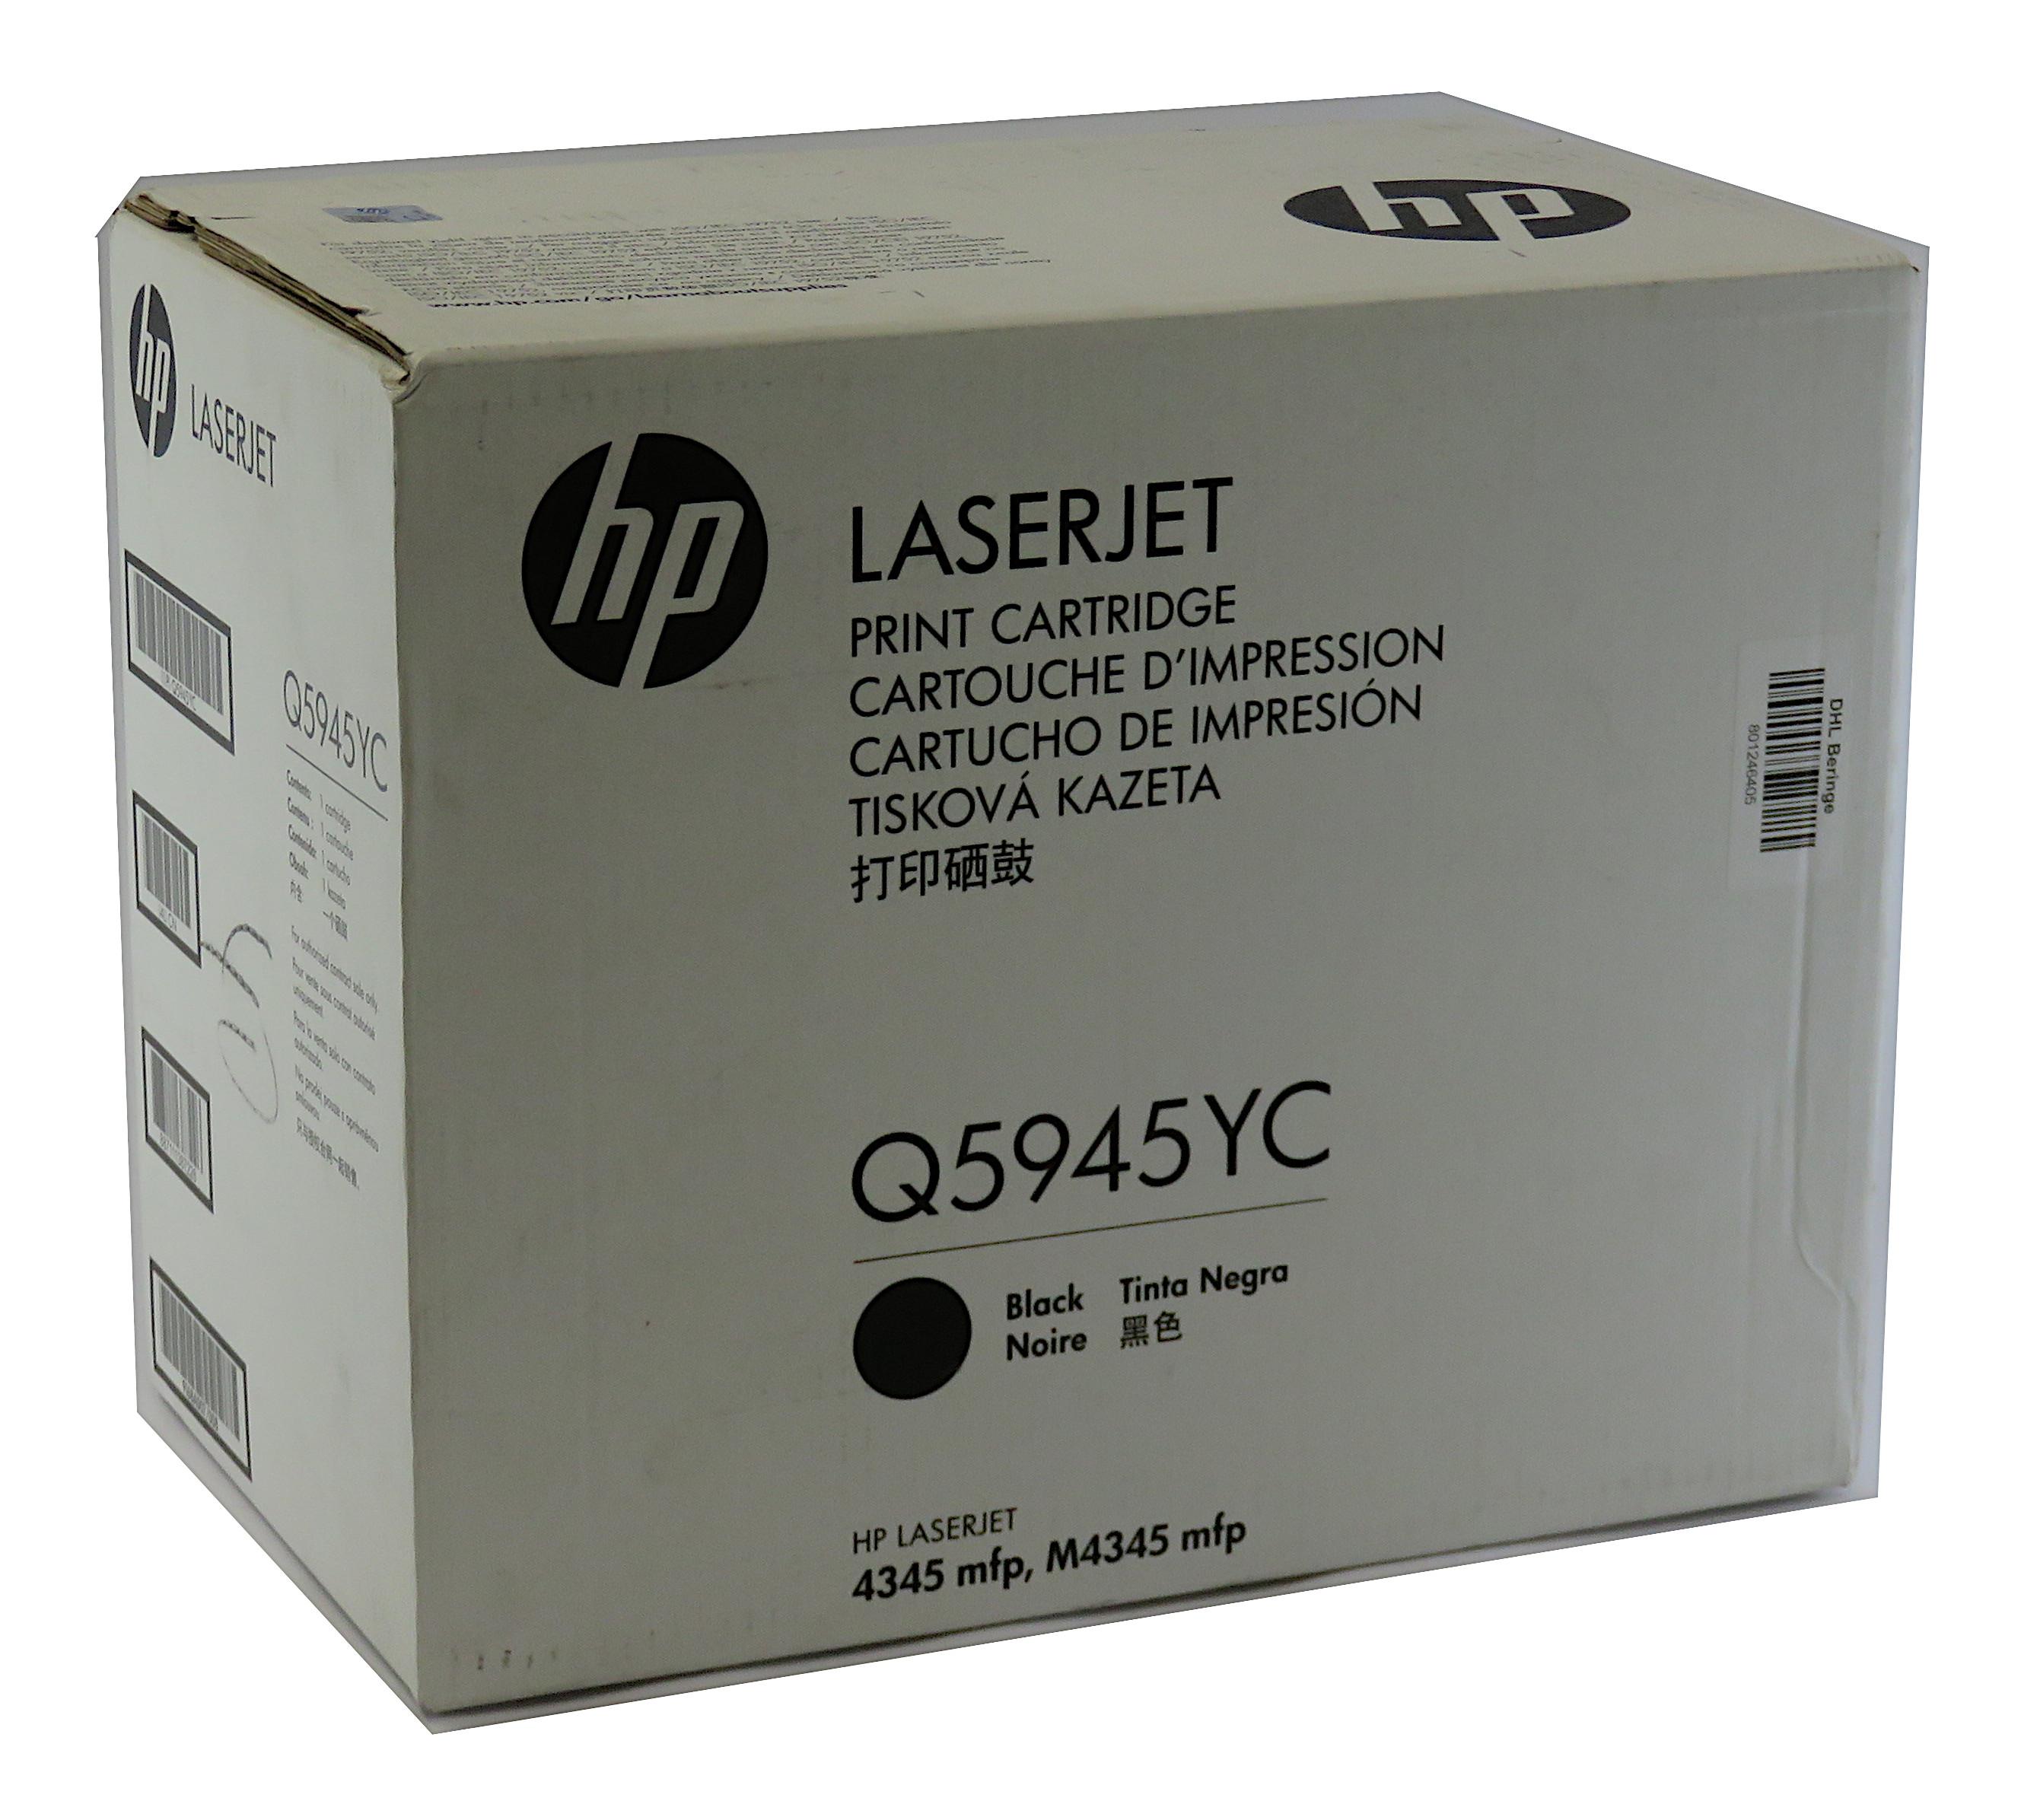 Genuine HP Q5945YC Black Print Cartridge f/ LaserJet 4345mfp M4345mfp